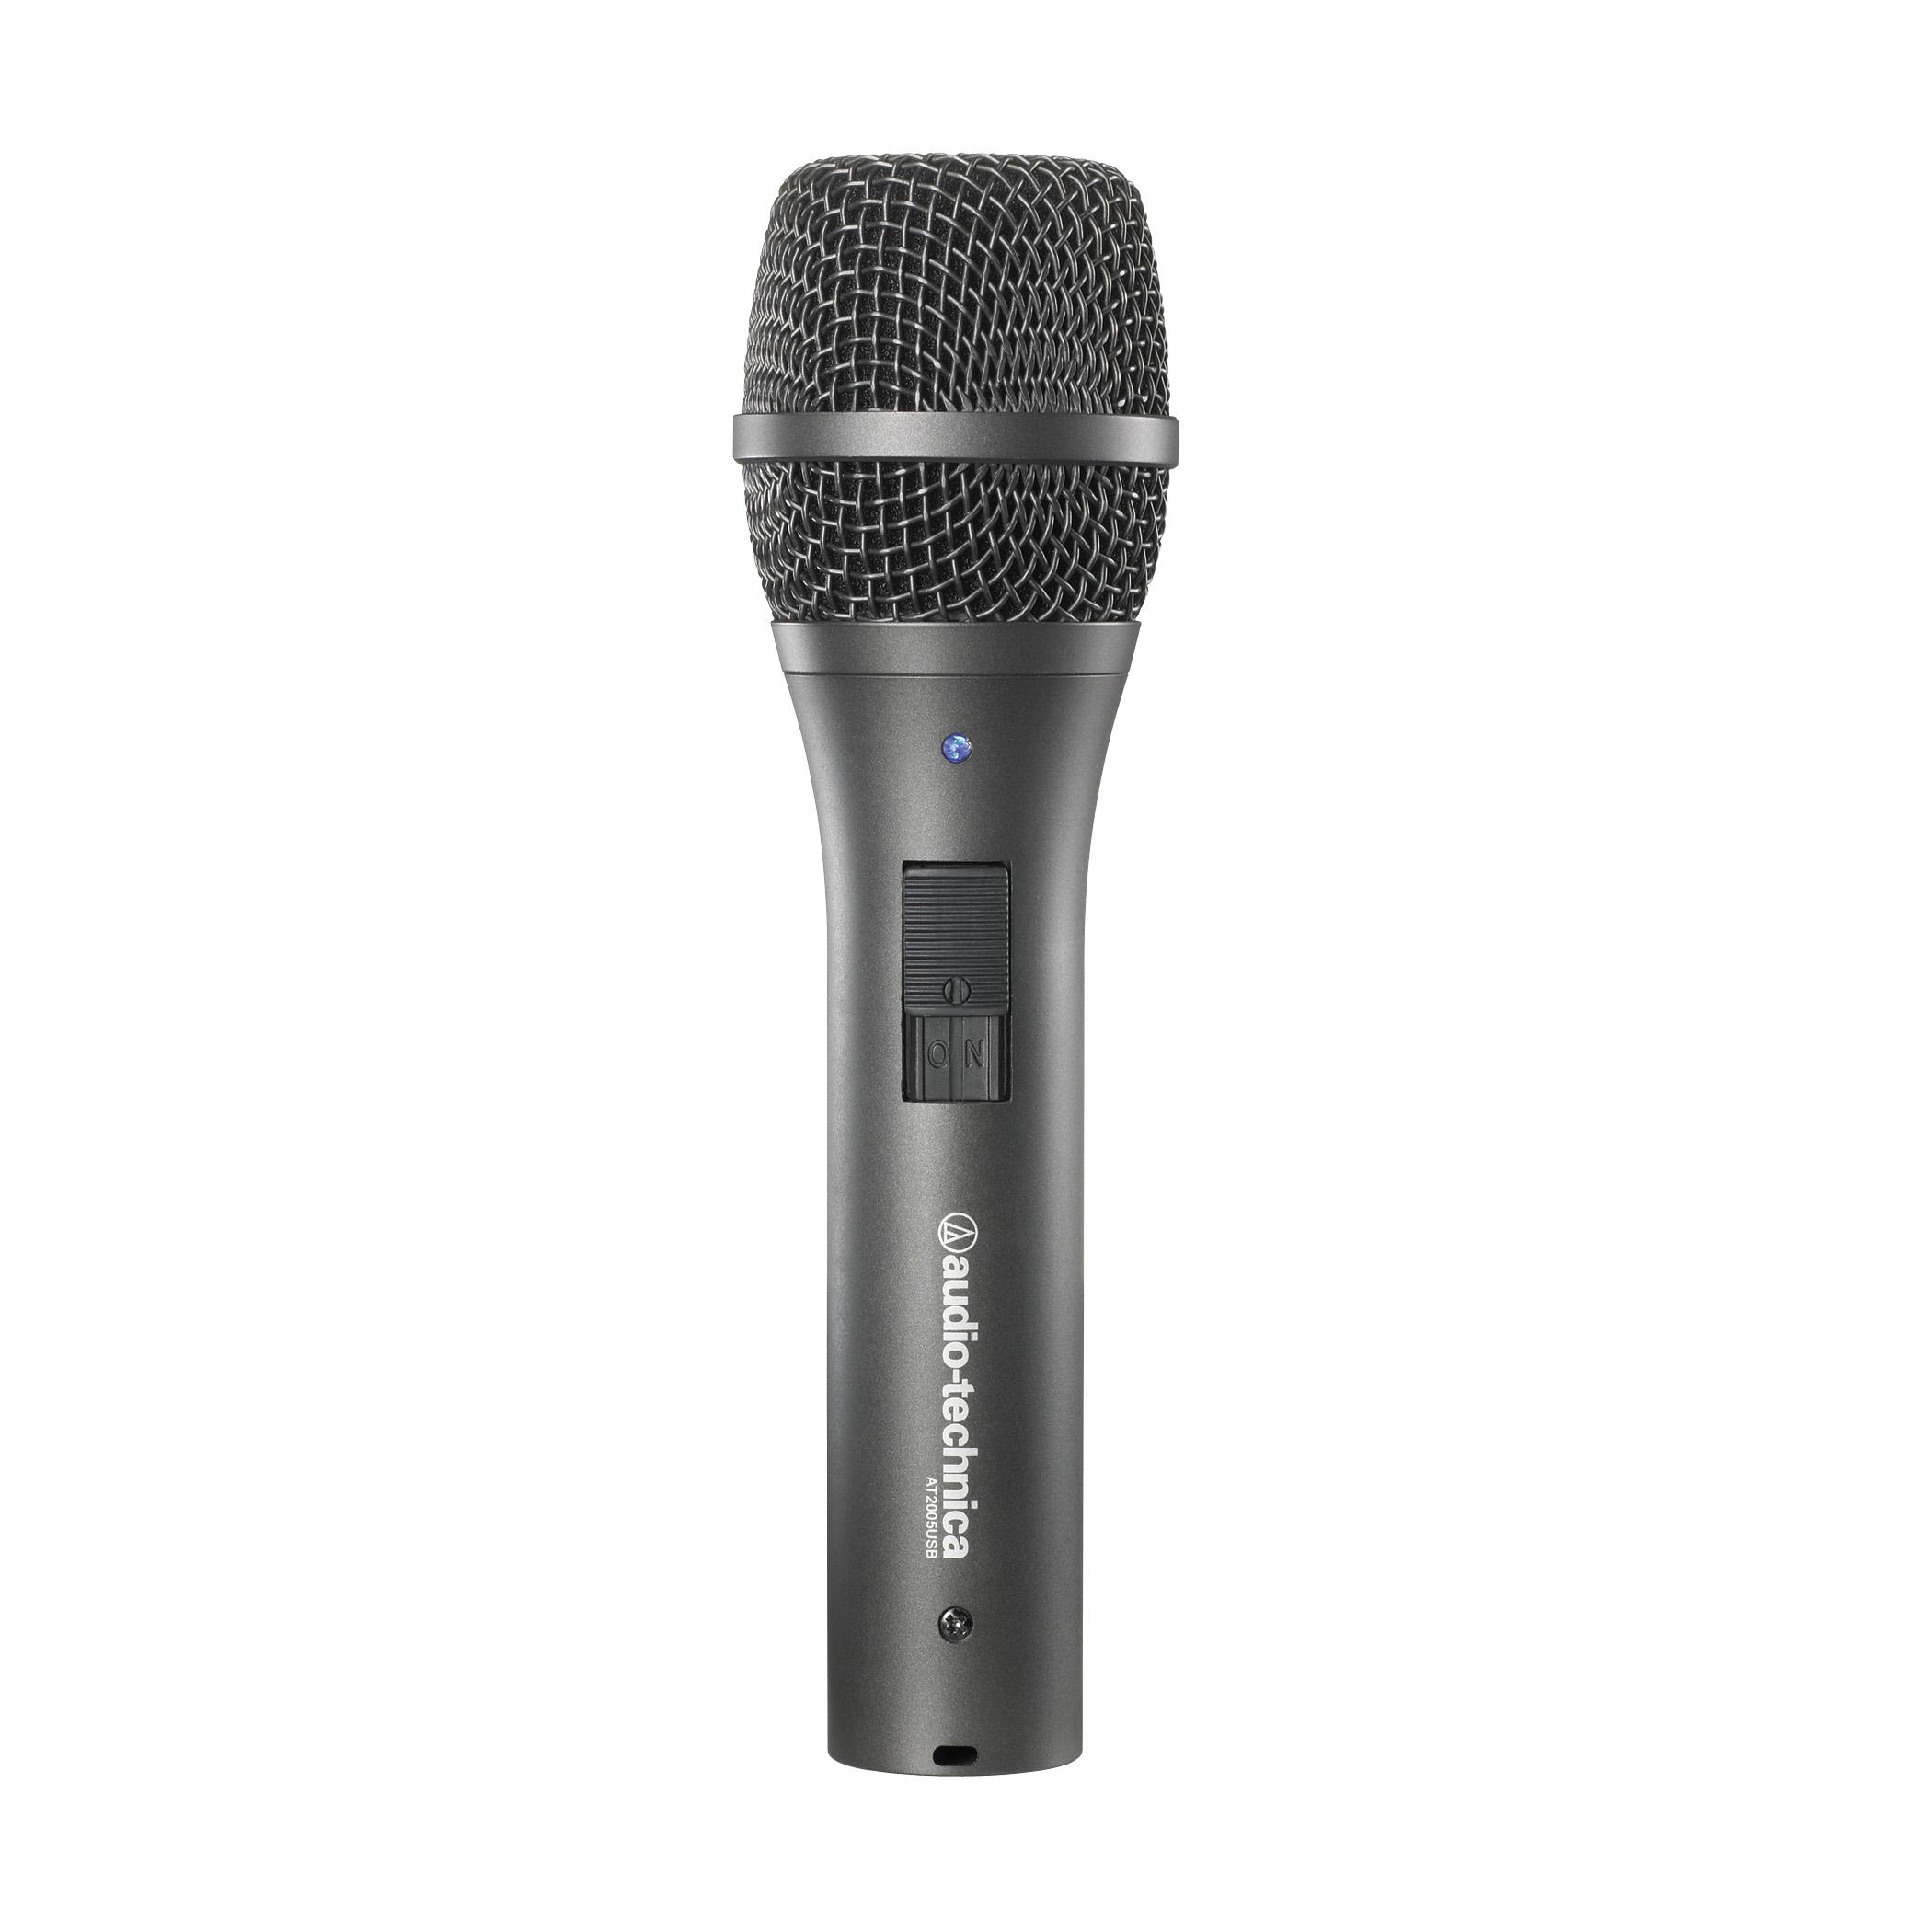 Audio-Technica AT2005USB Dynamic Handheld USB and XLR Microphone